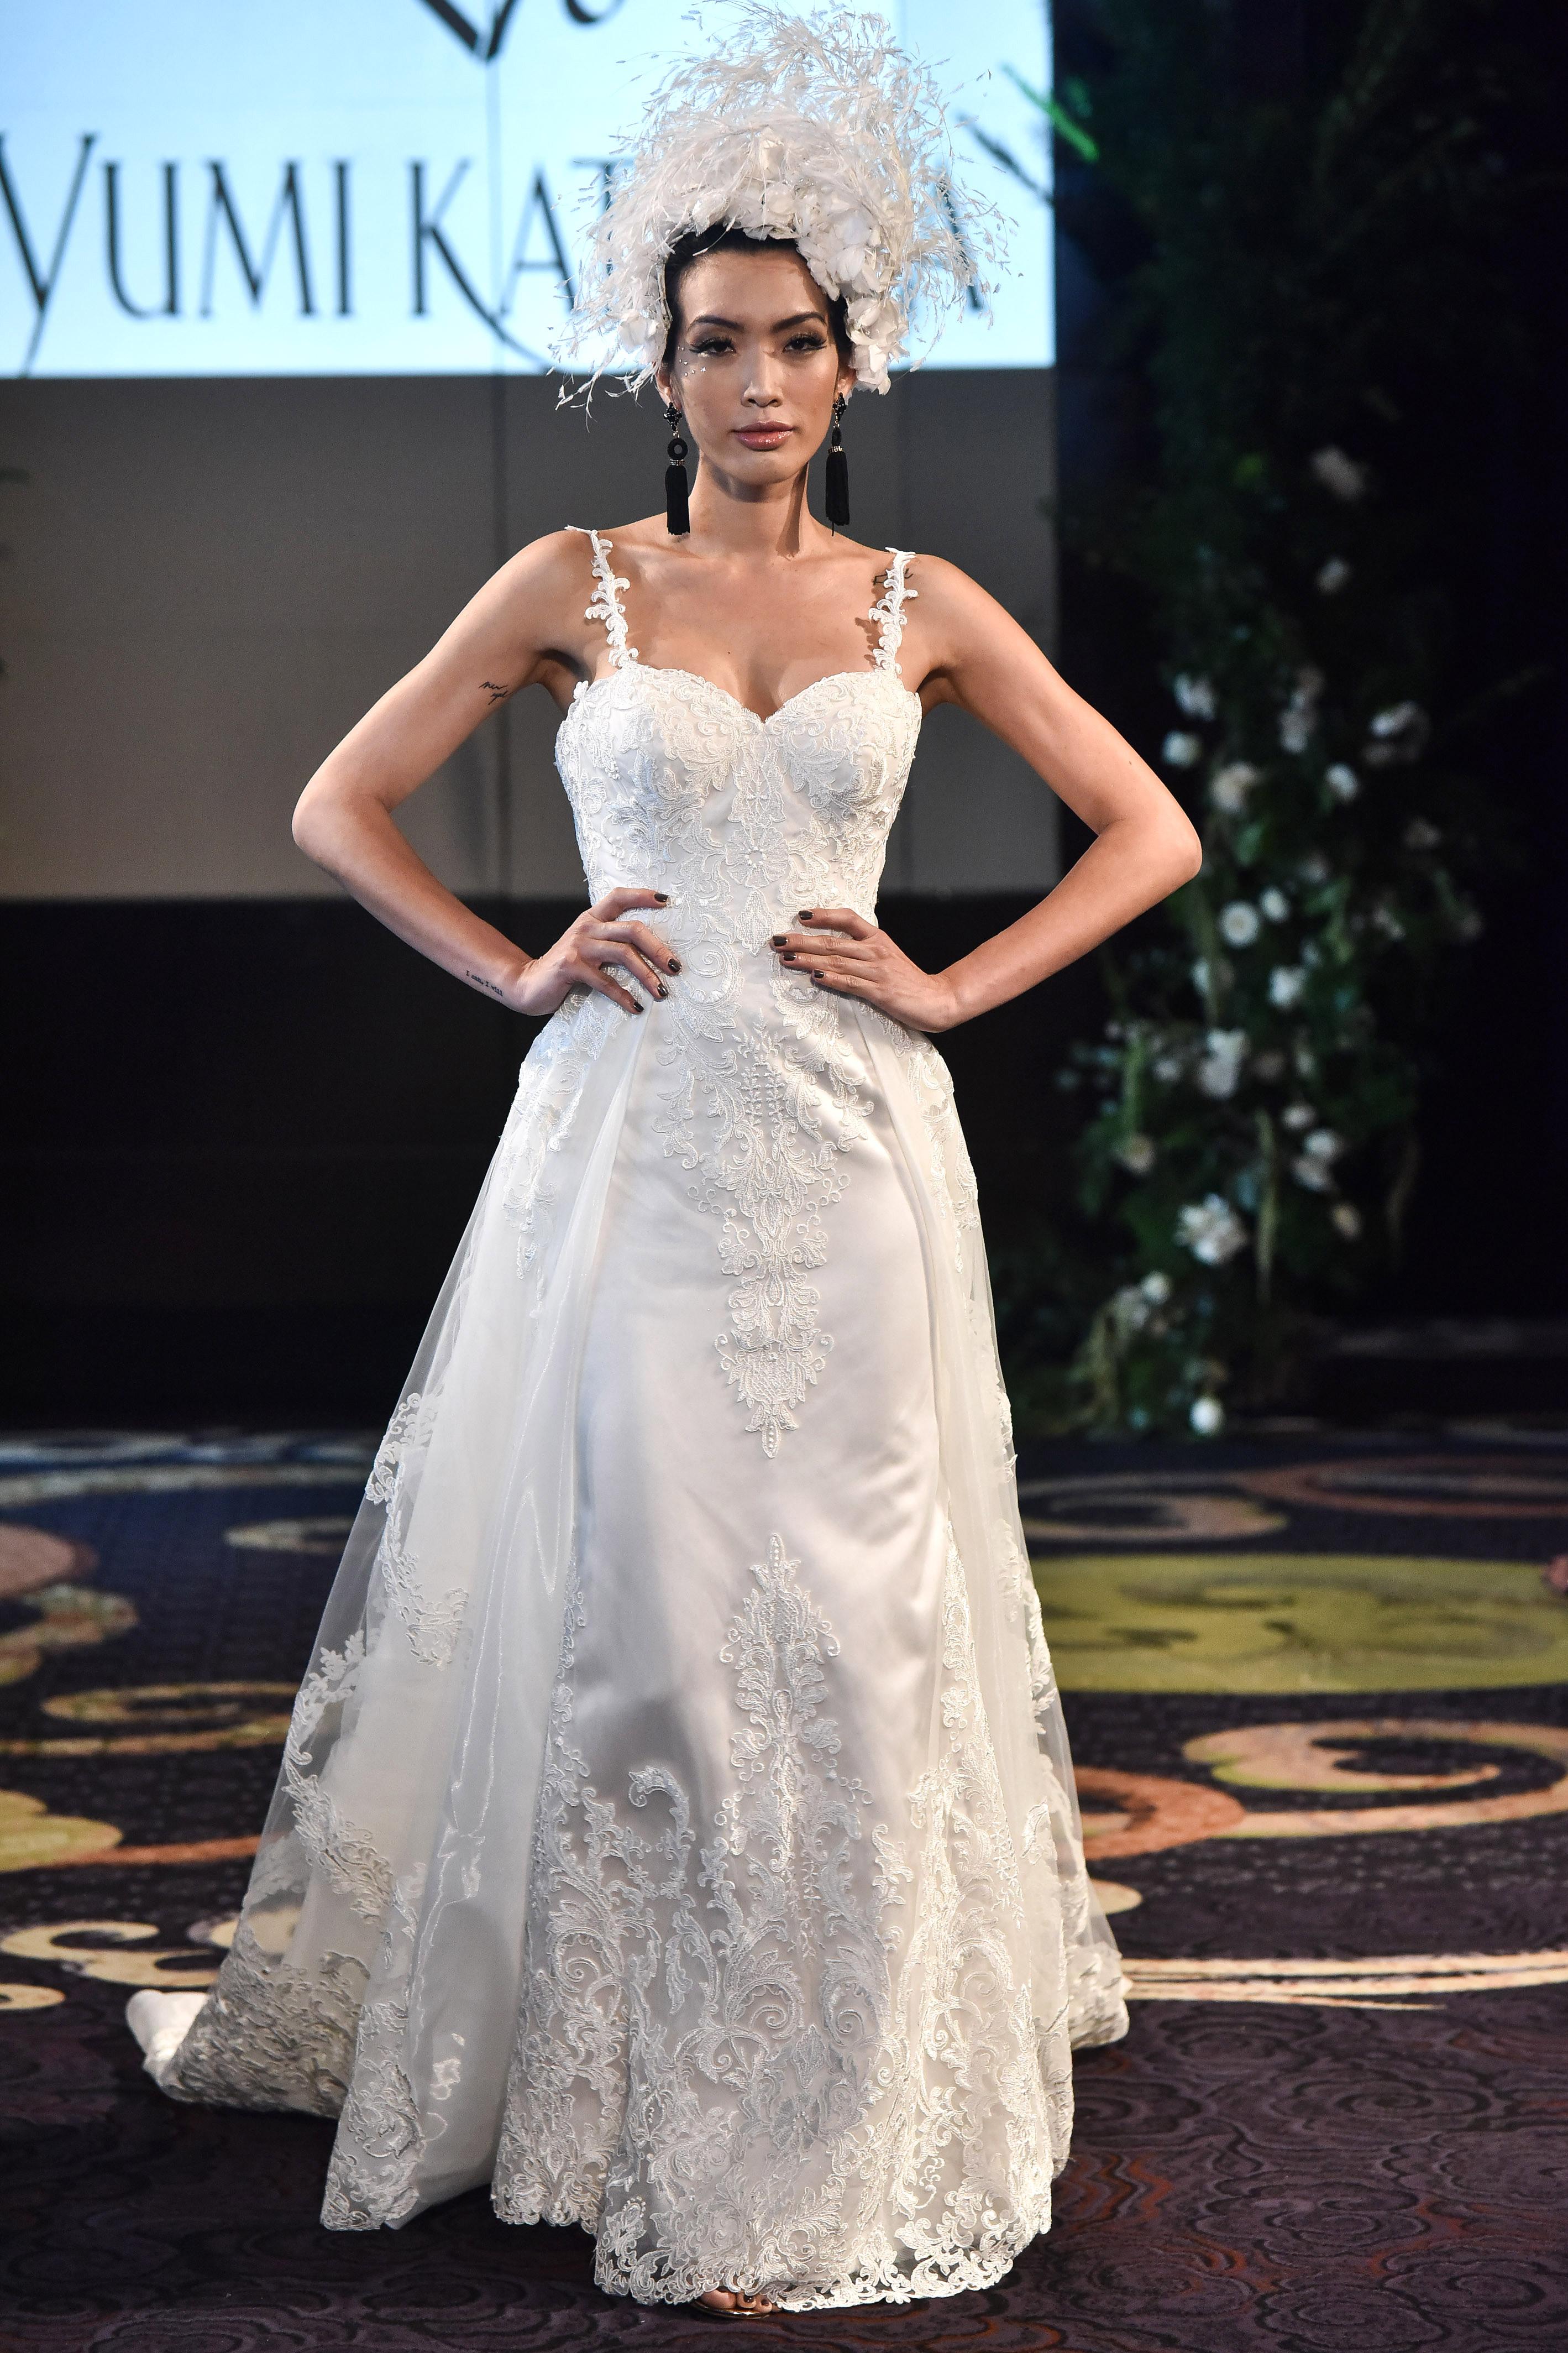 yumi katsura fall 2018 overlay spaghetti strap wedding dress